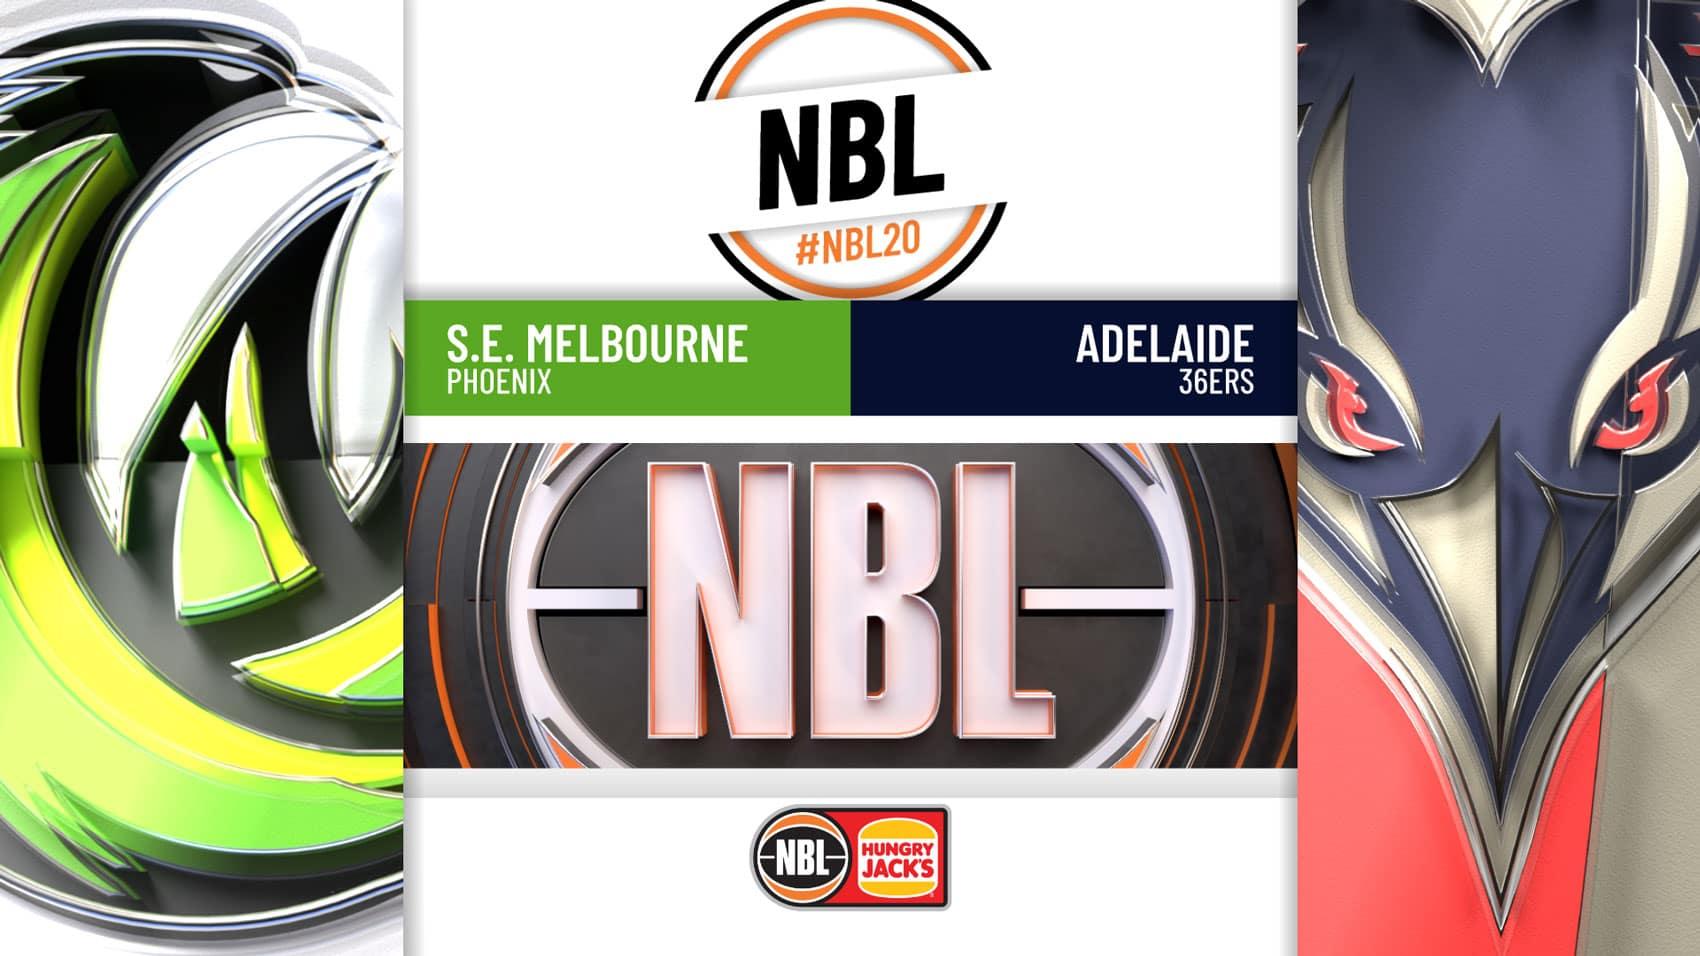 2019 NBL Online Graphics 13 Girraphic